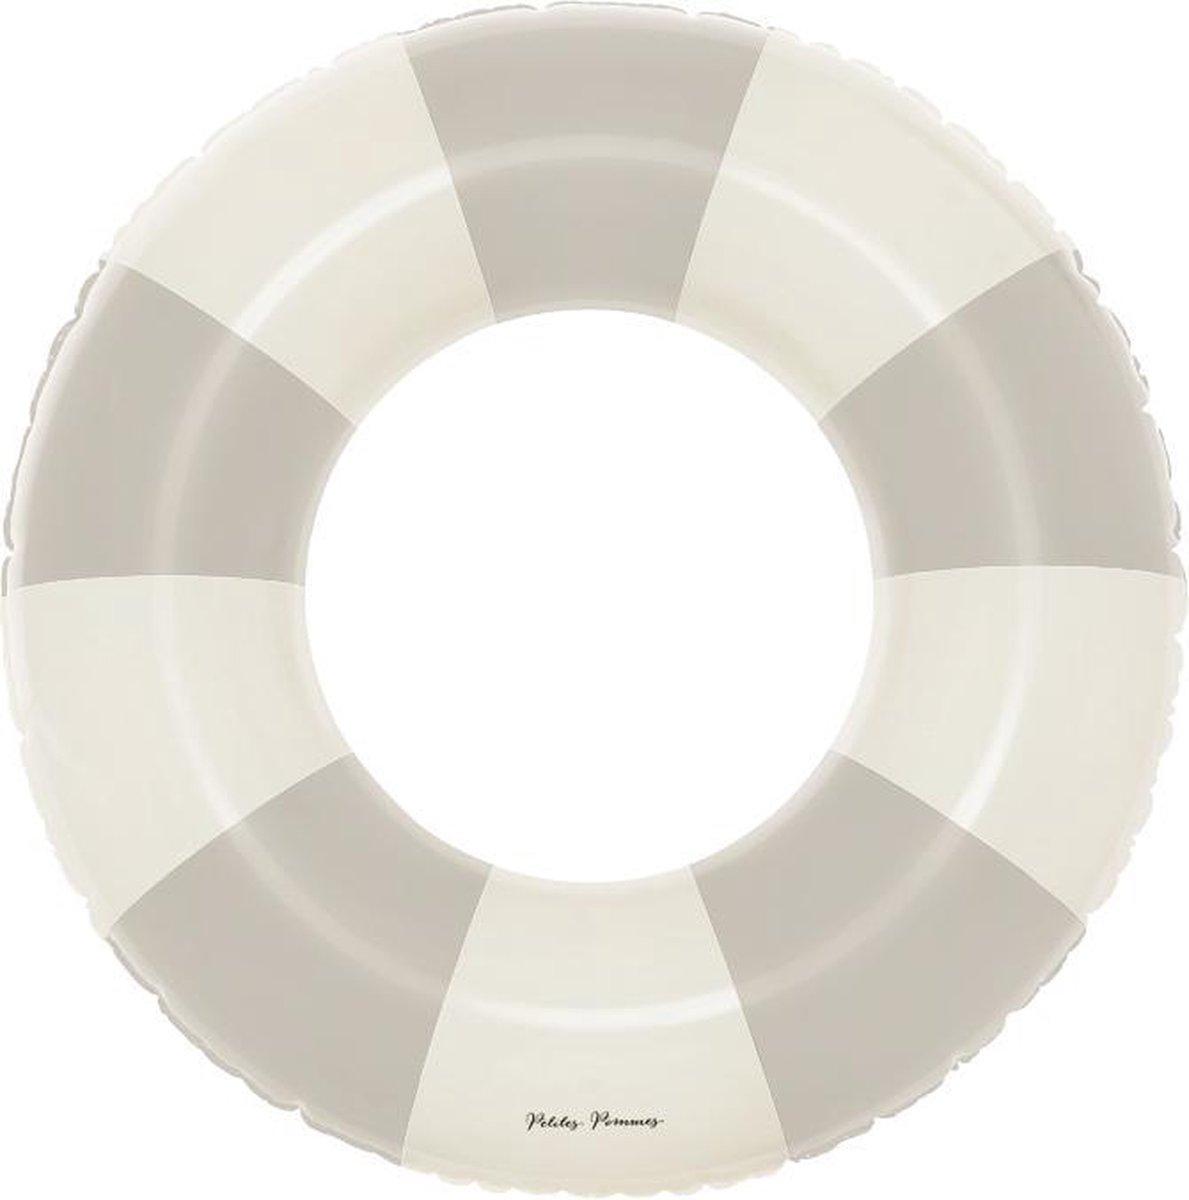 Petites Pommes Zwemring Olivia Emma - Zwemband - 45 cm - 1 tot 3 jaar